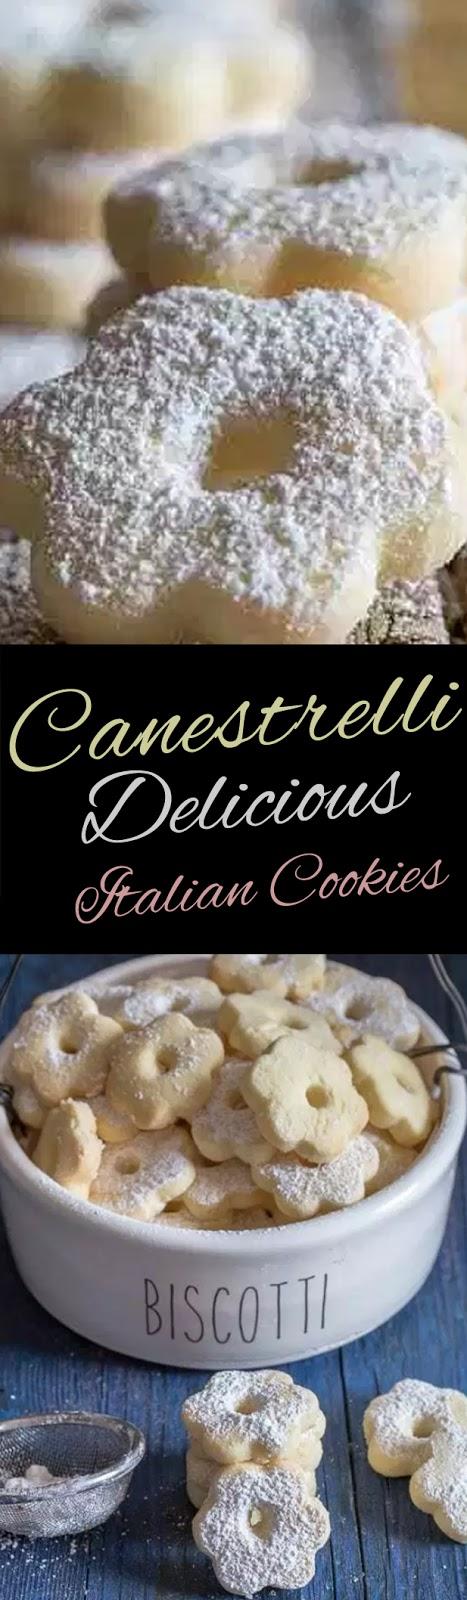 Canestrelli Delicious Italian Cookies